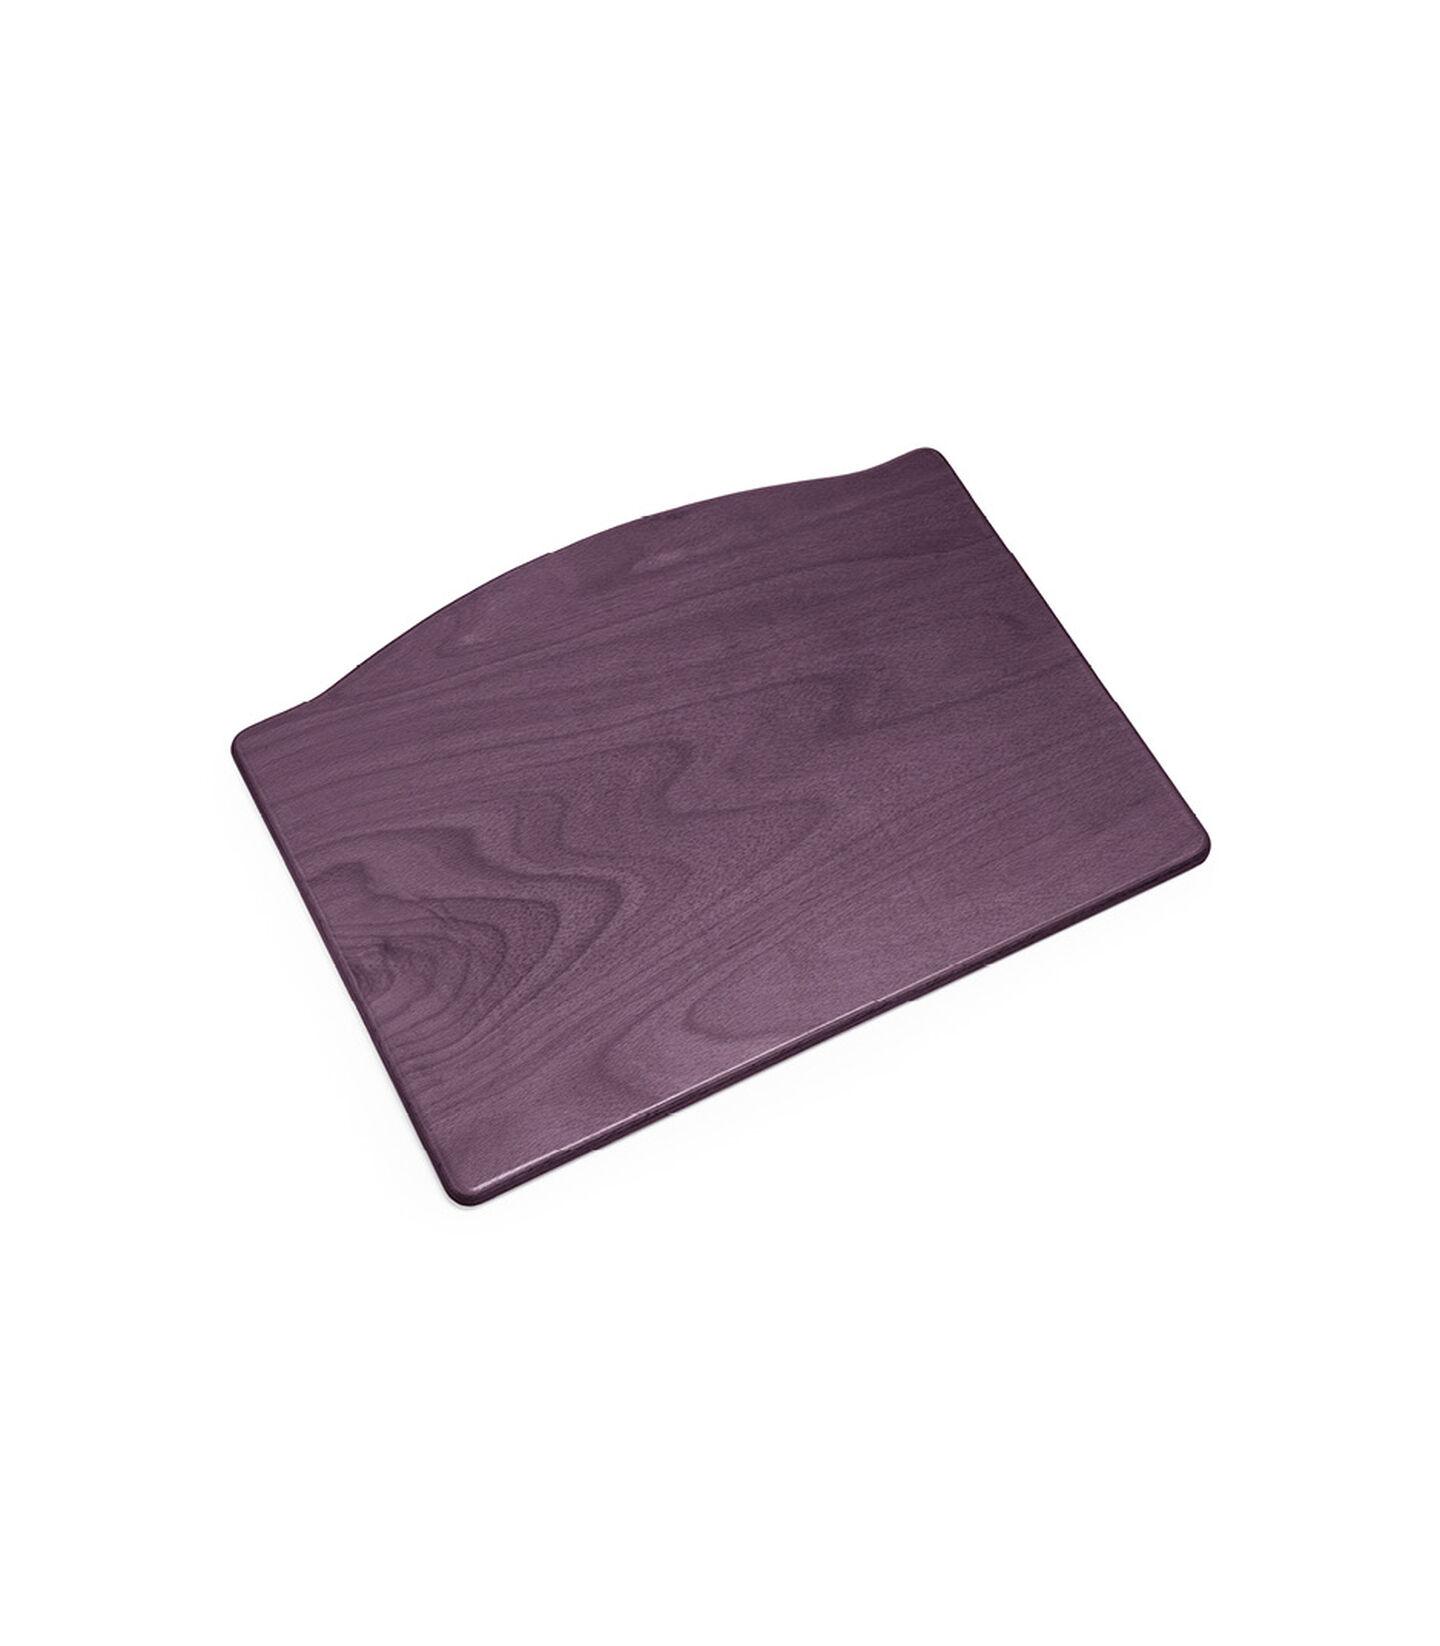 Tripp Trapp® Footplate Plum Purple, Prune, mainview view 2